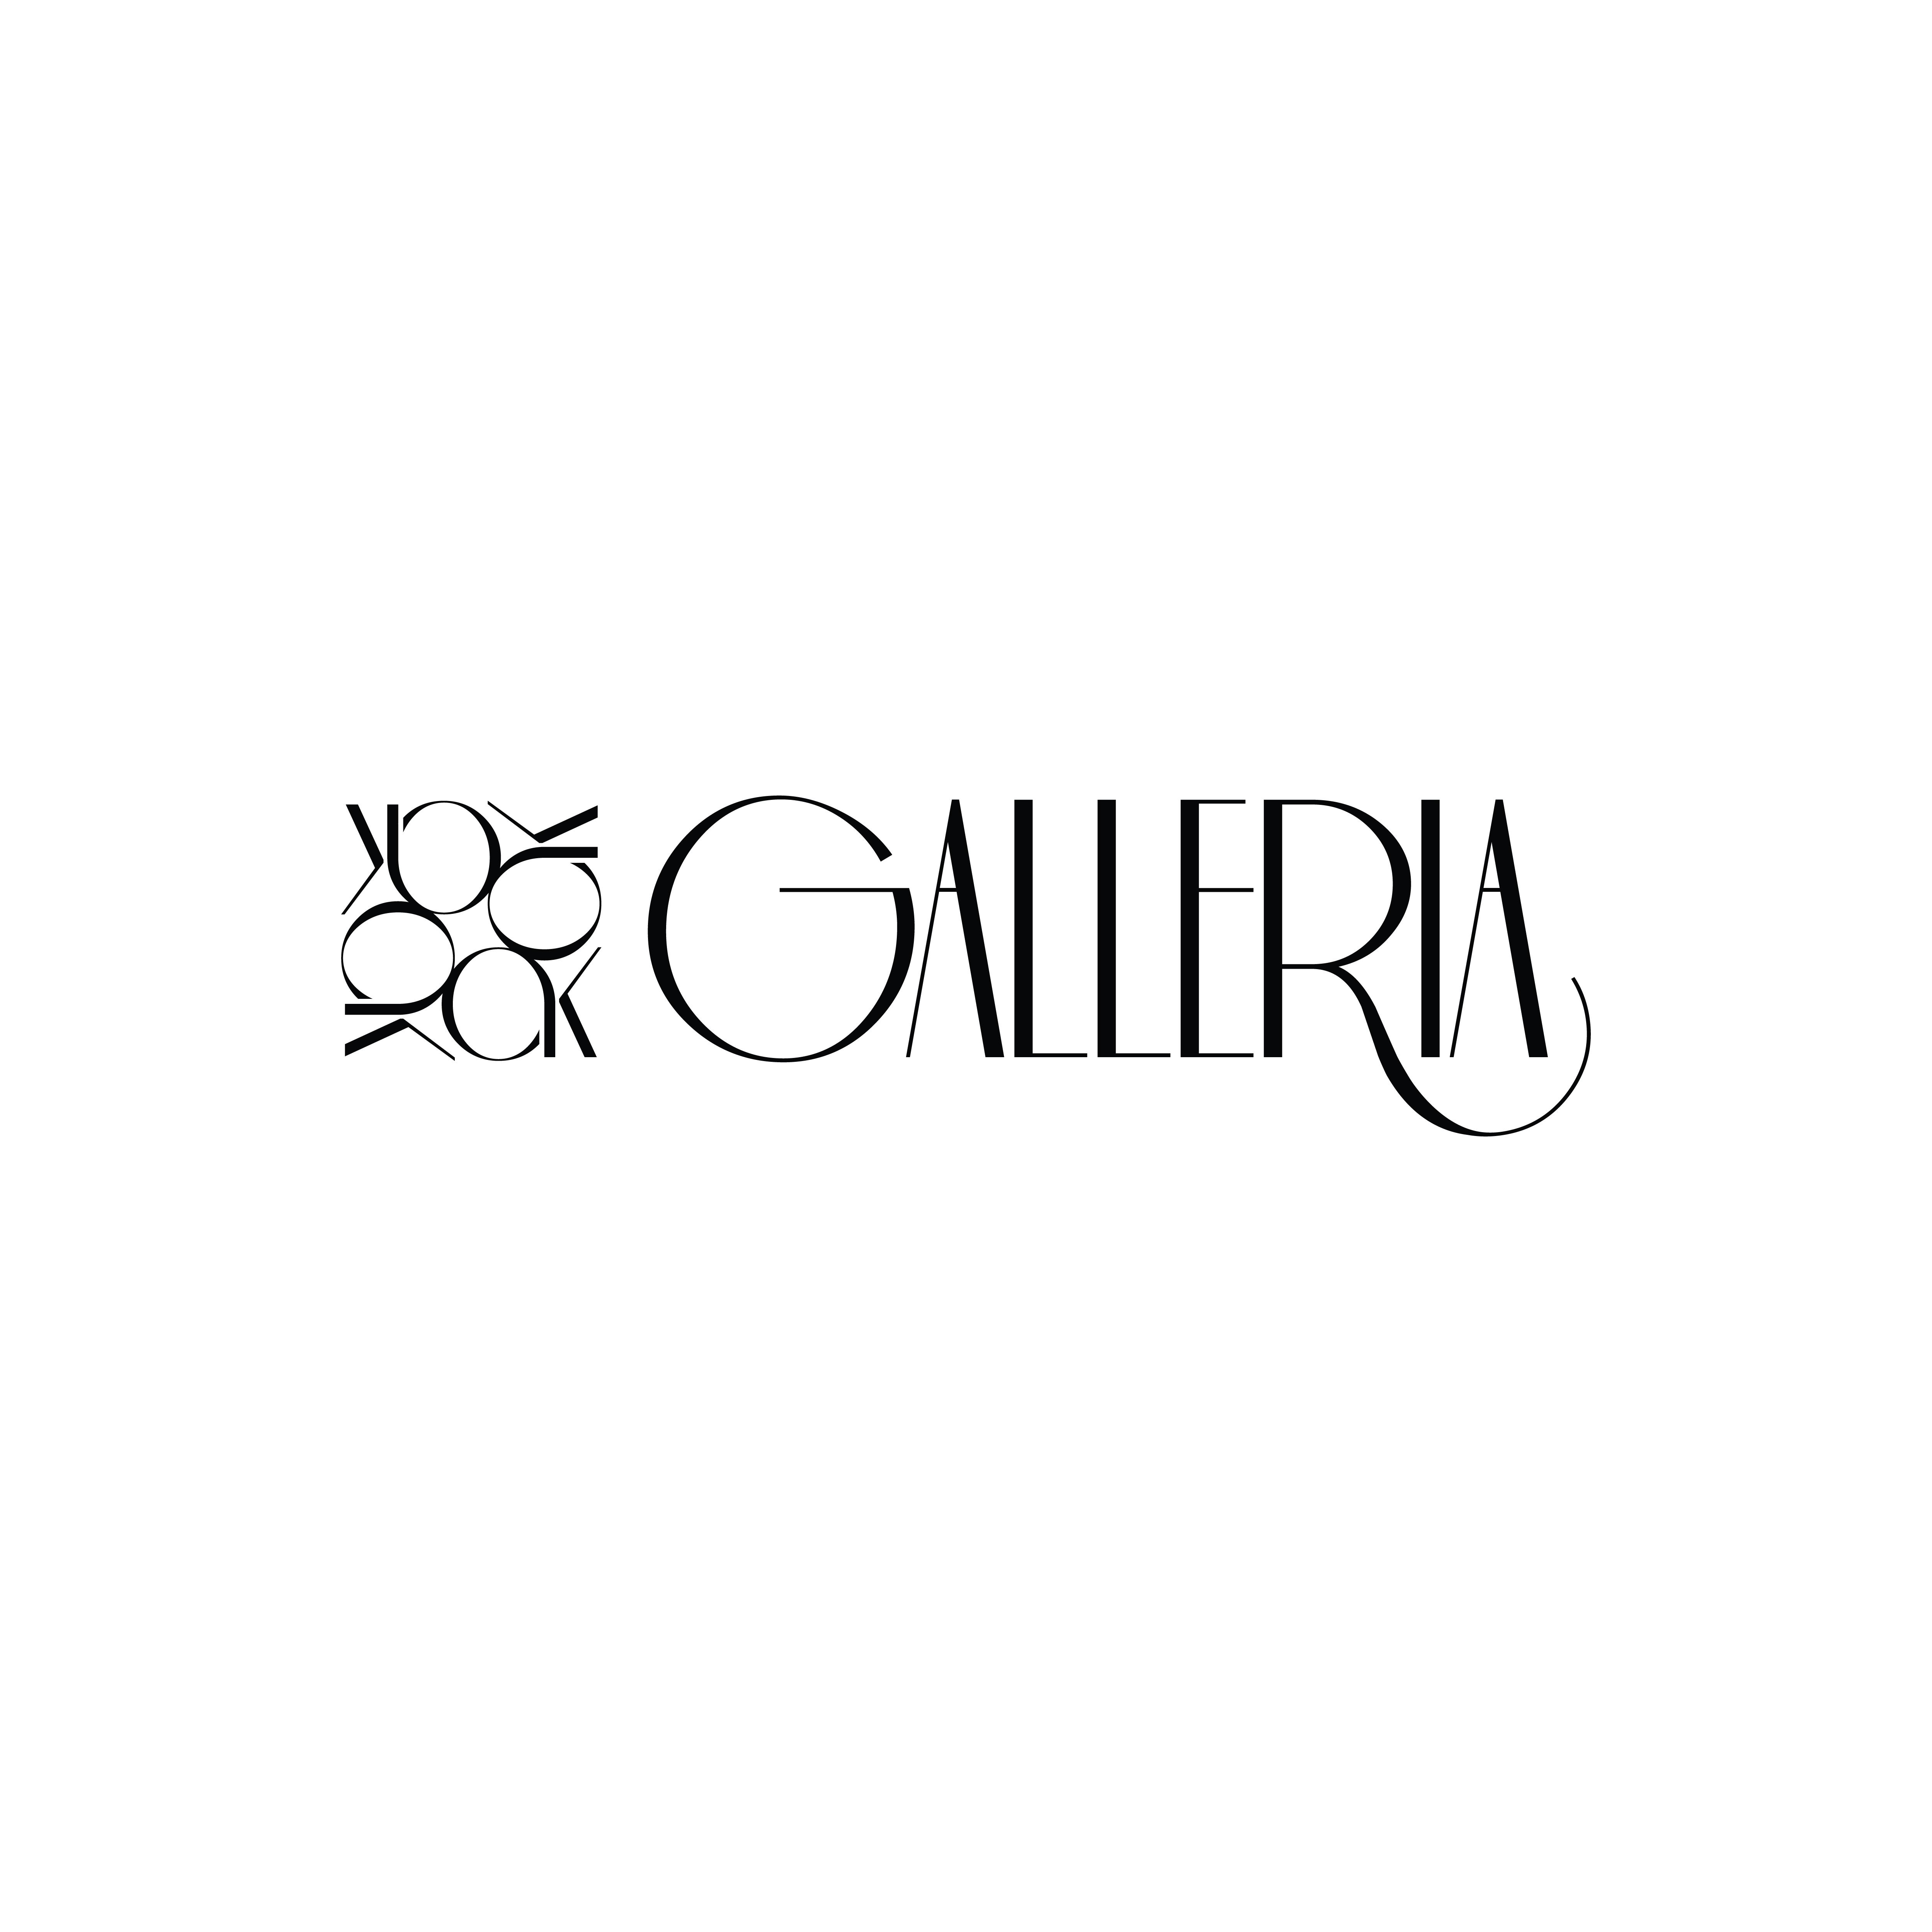 96d186ae6089 Traycey - ALDO - Brands - Women - AKGalleria